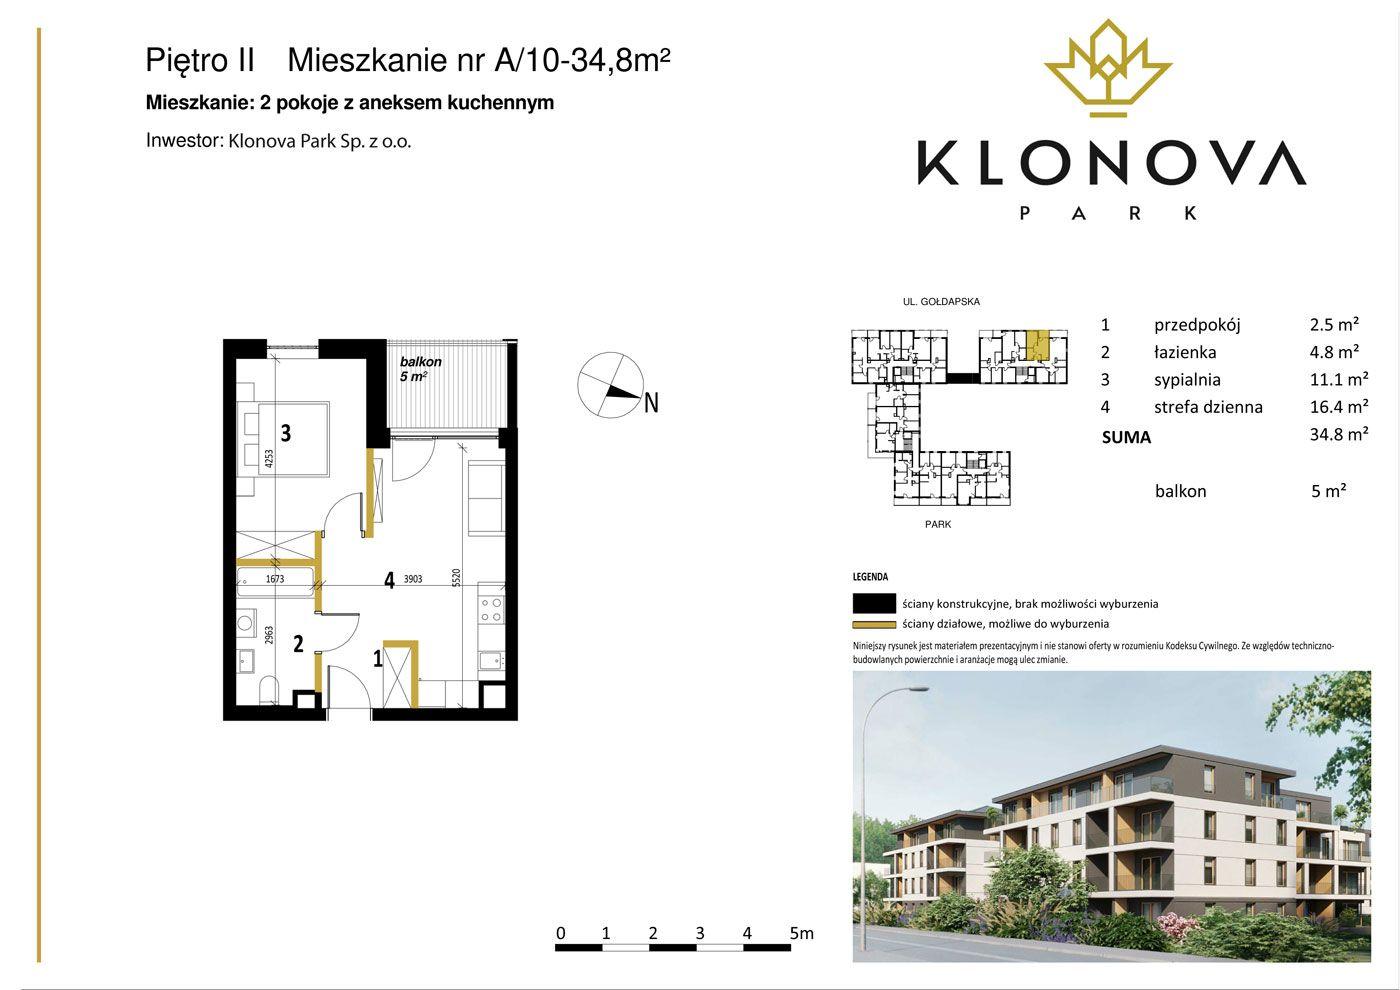 Apartamenty Klonova Park - Plan mieszkania A/10